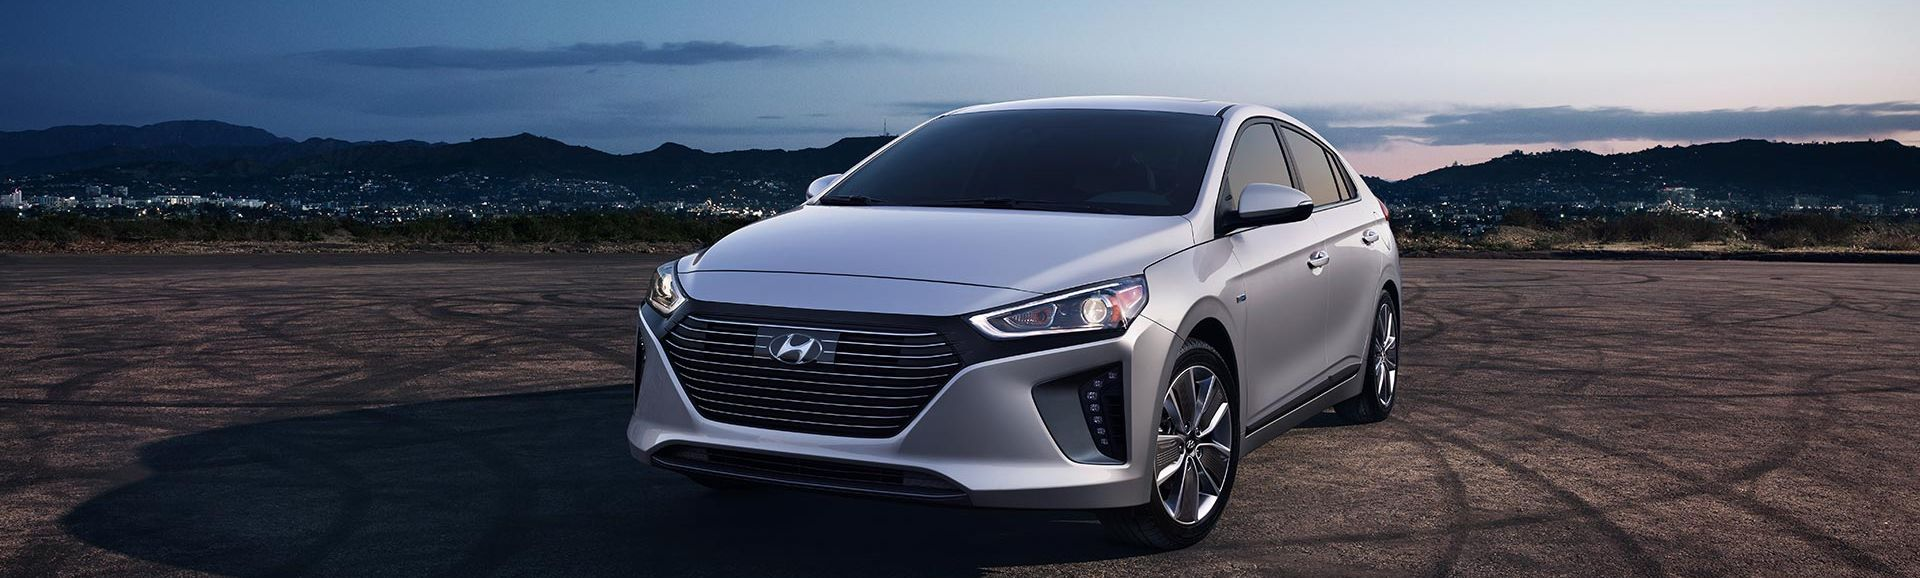 2019 Hyundai Ioniq Hybrid Leasing near Alexandria, VA